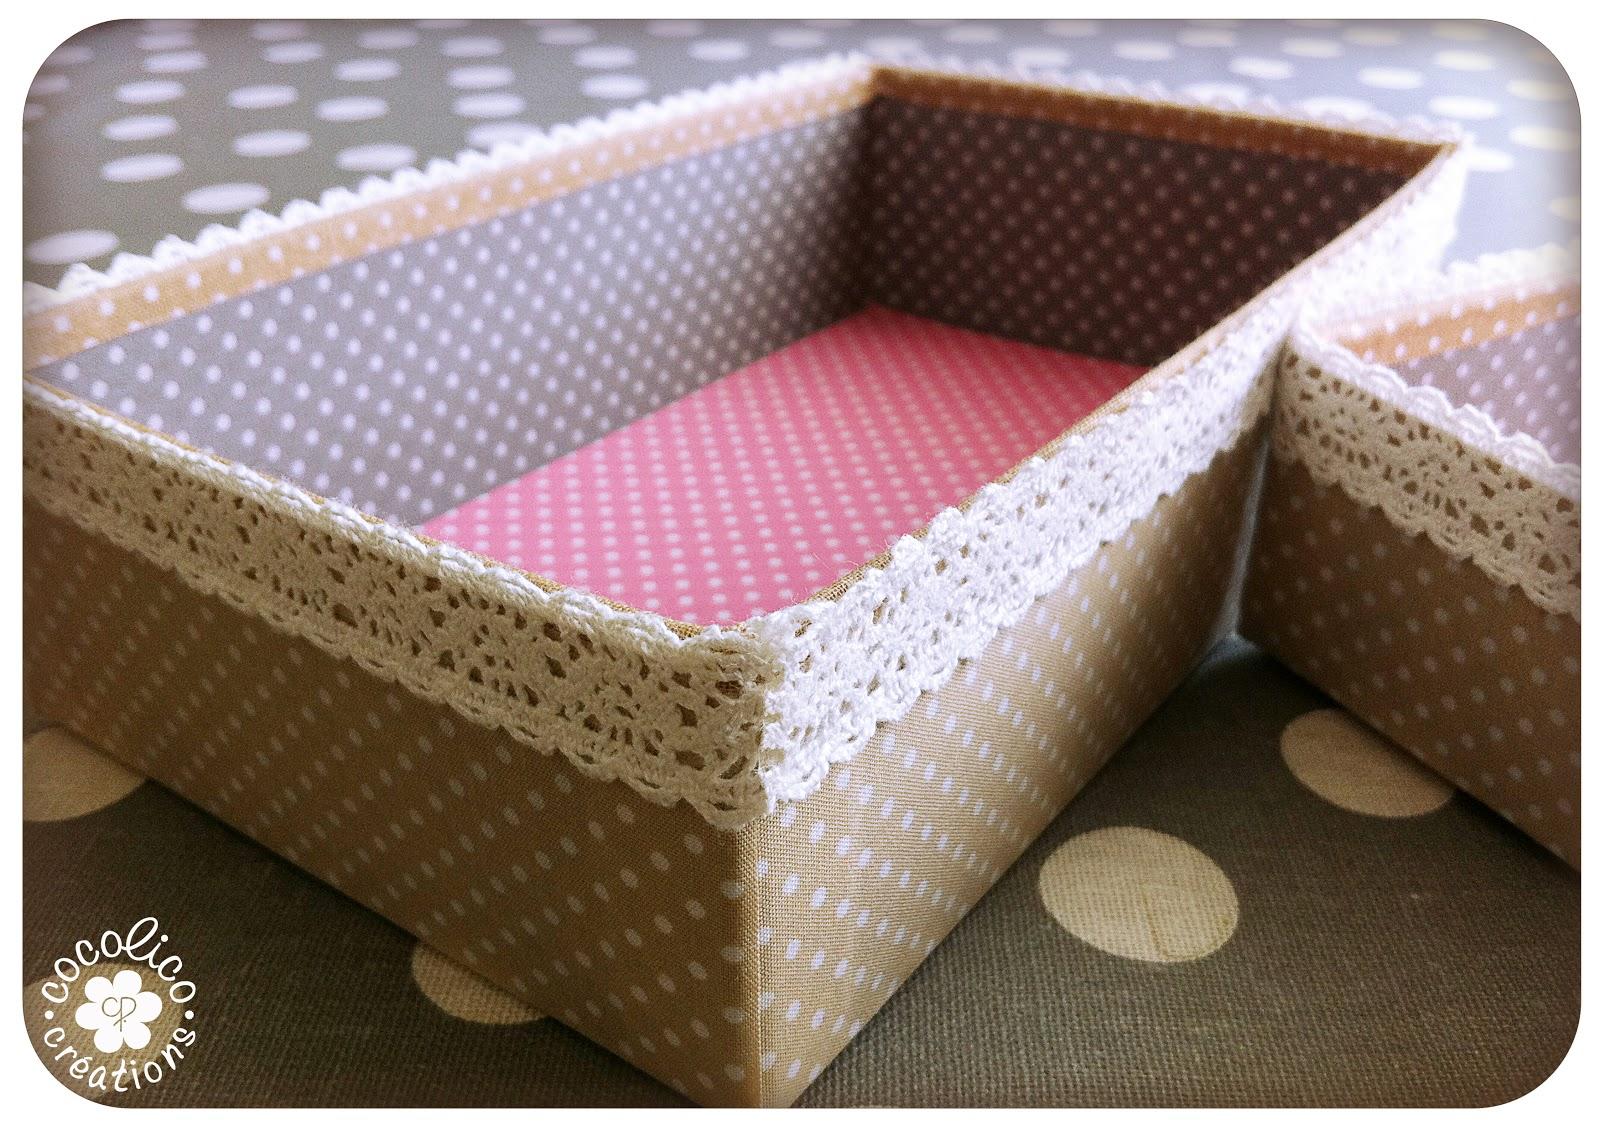 cocolico creations des boites pour mes galets. Black Bedroom Furniture Sets. Home Design Ideas